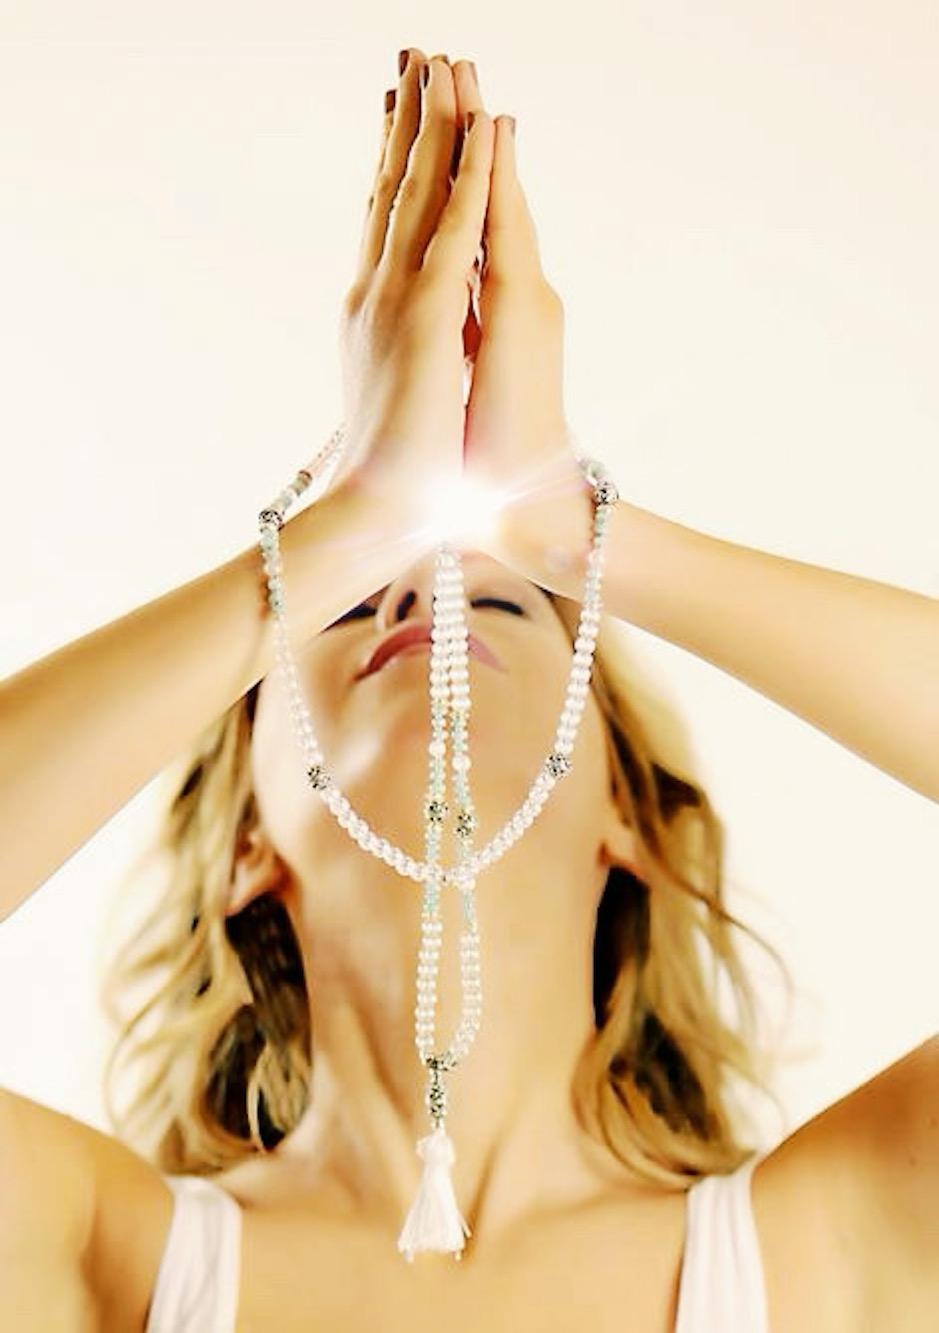 Kundalini-Meditation für Selbstermächtigung